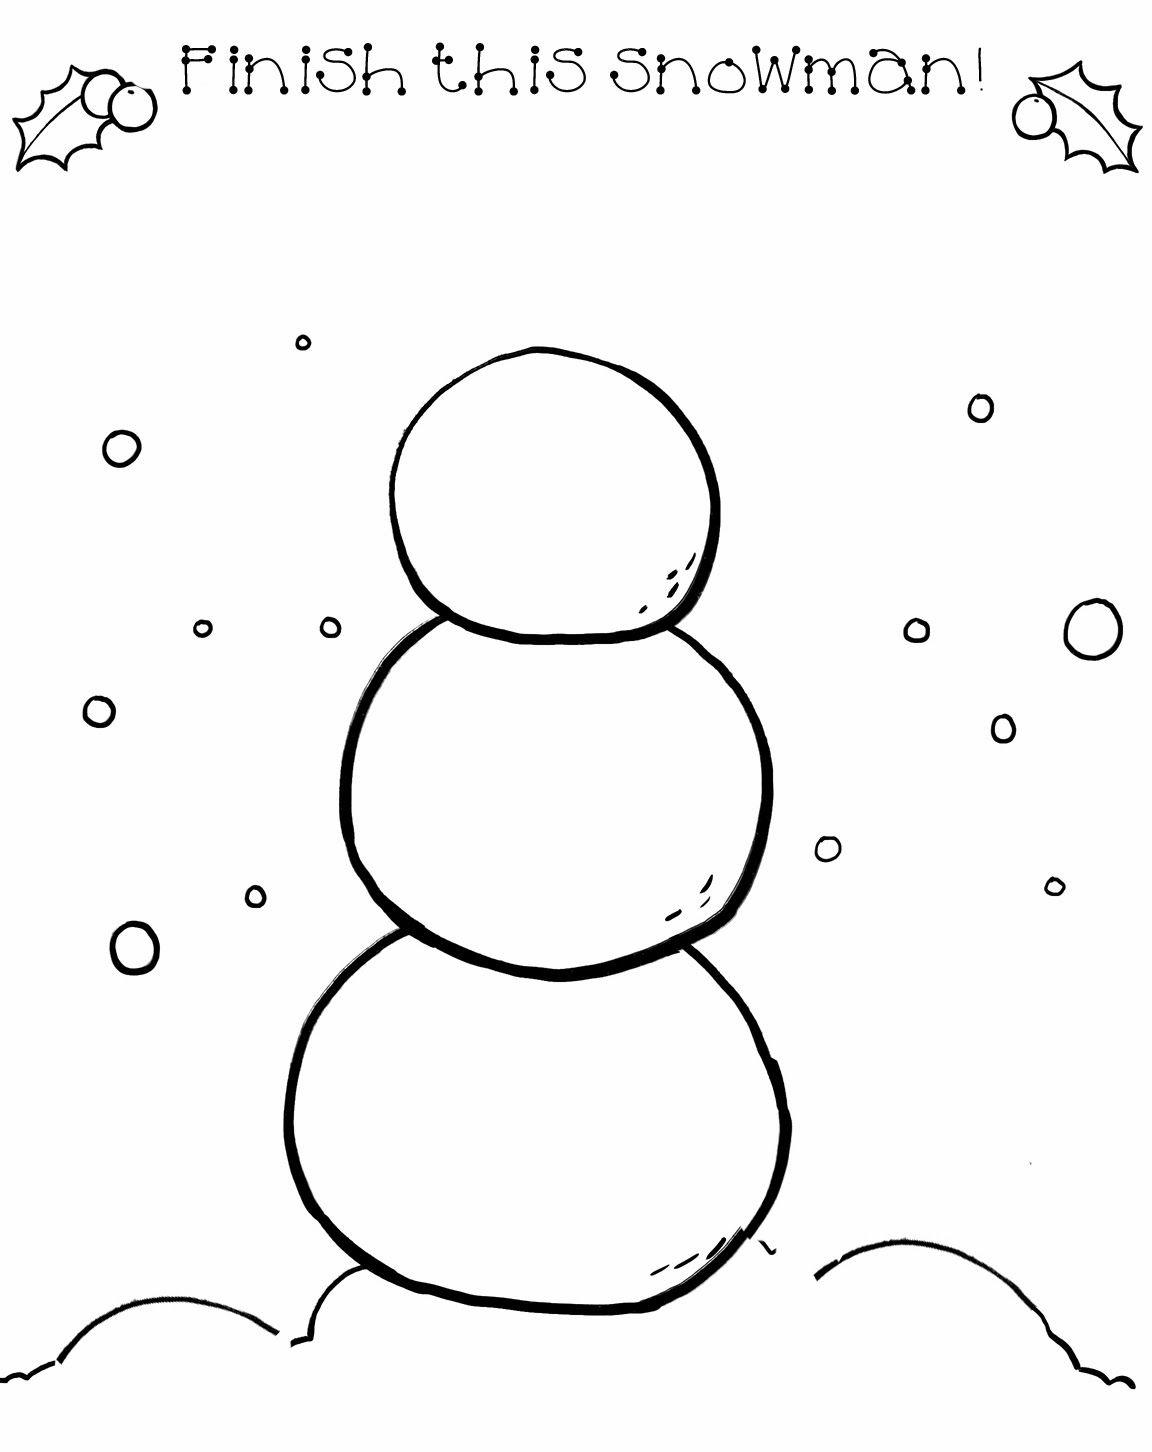 Snowman Drawing Activity For Print 1 152 1 452 Pixels